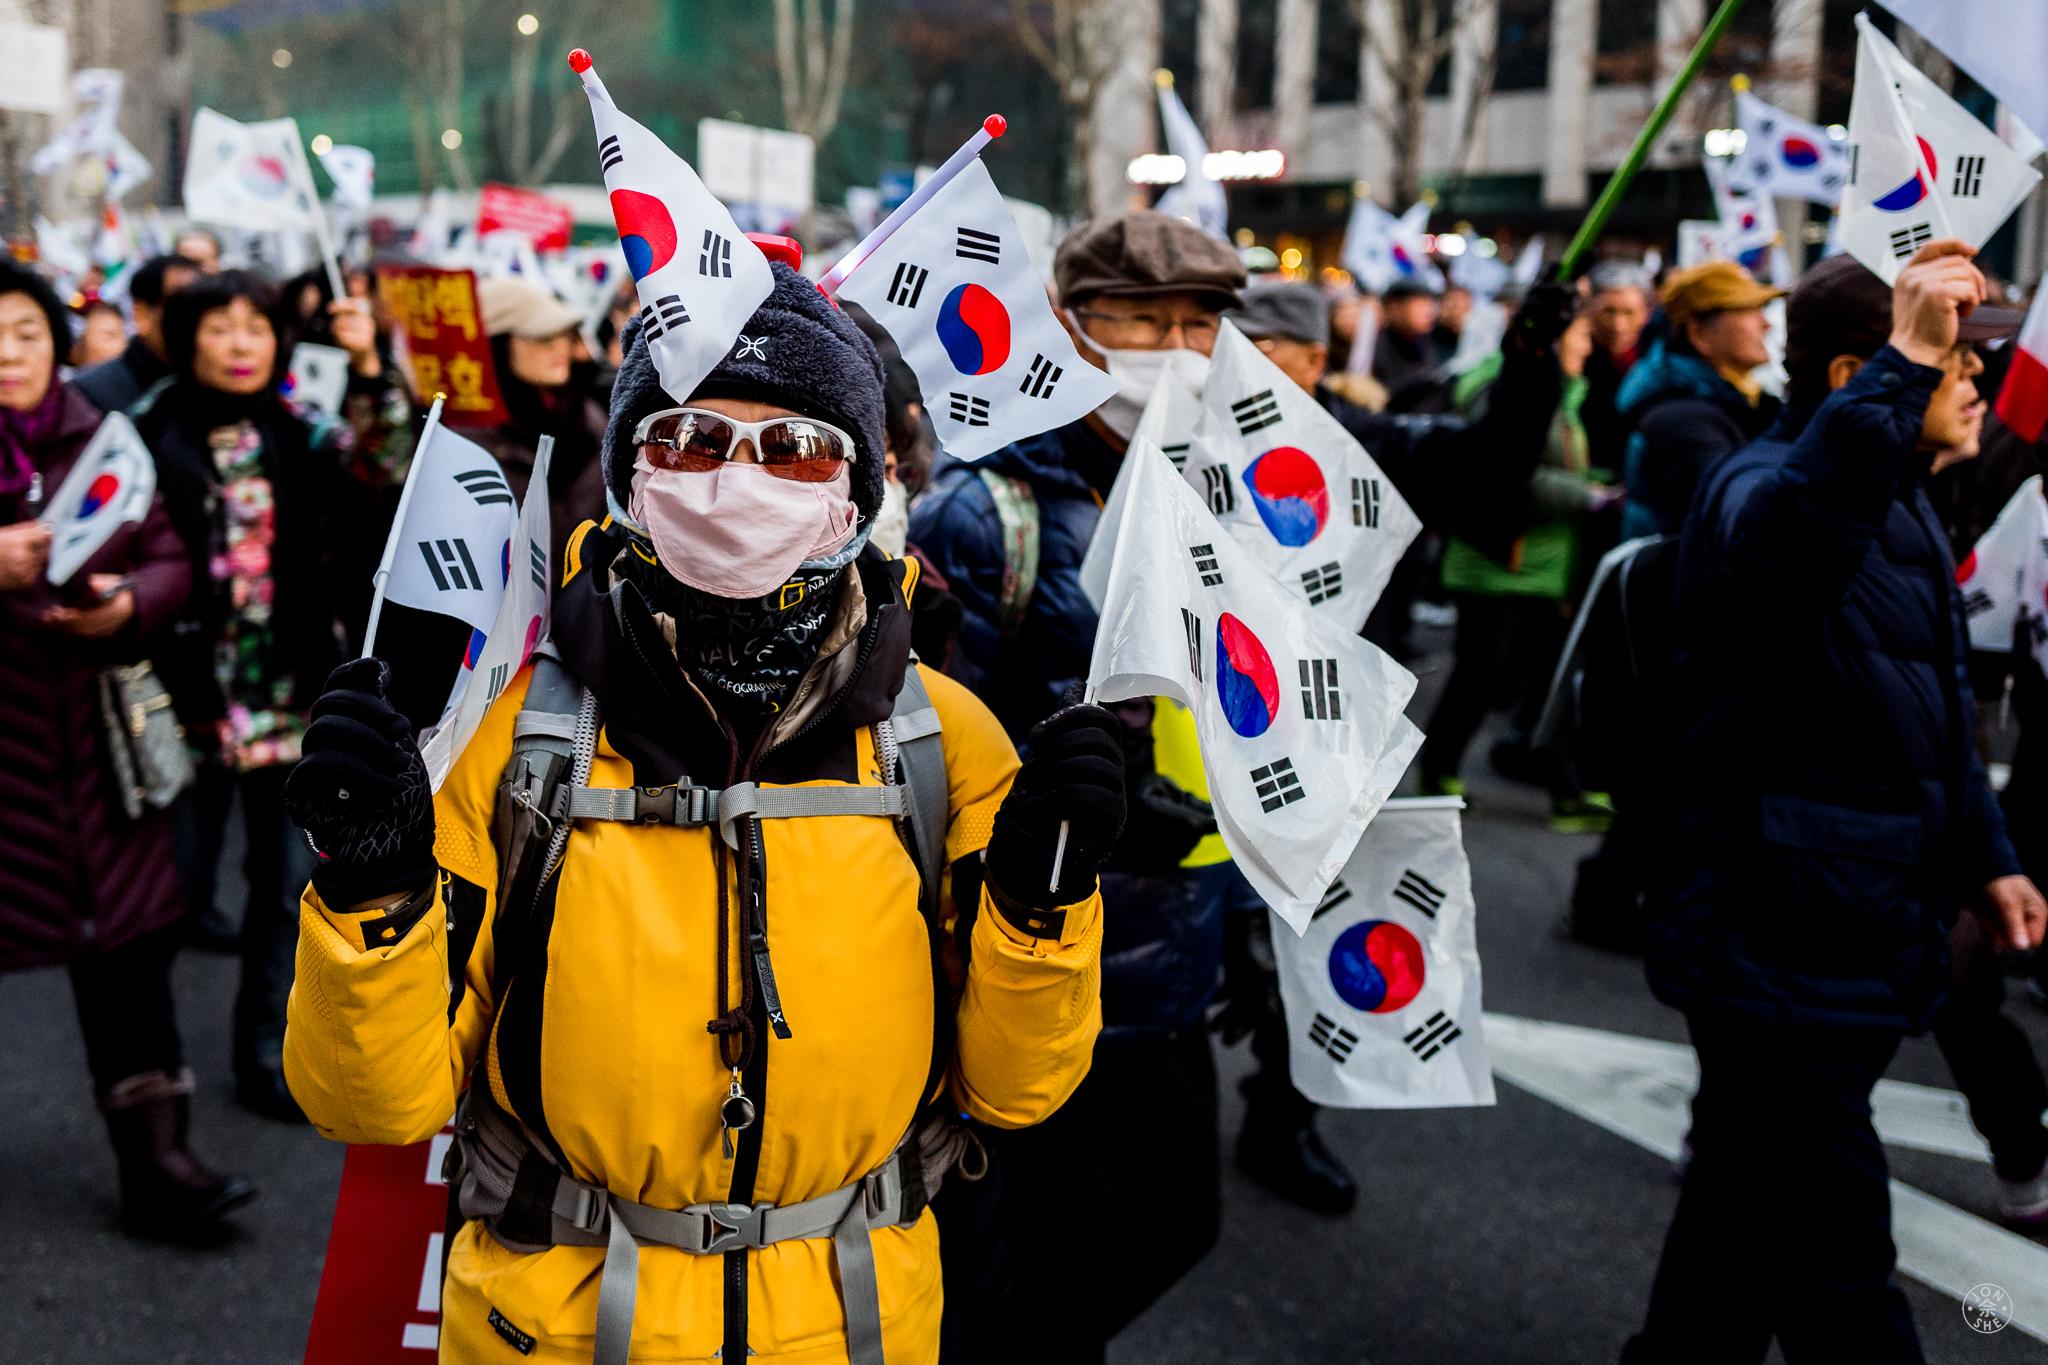 """Gangnam Carnivale (1)"". Peaceful demonstrations appear to take the place of a festive Carnivale in Seoul.Seoul, South Korea. January 2017. © Jon She. Leica Q (Typ 116), Leica Summilux 28mm f/1.7 ASPH (FLE)."